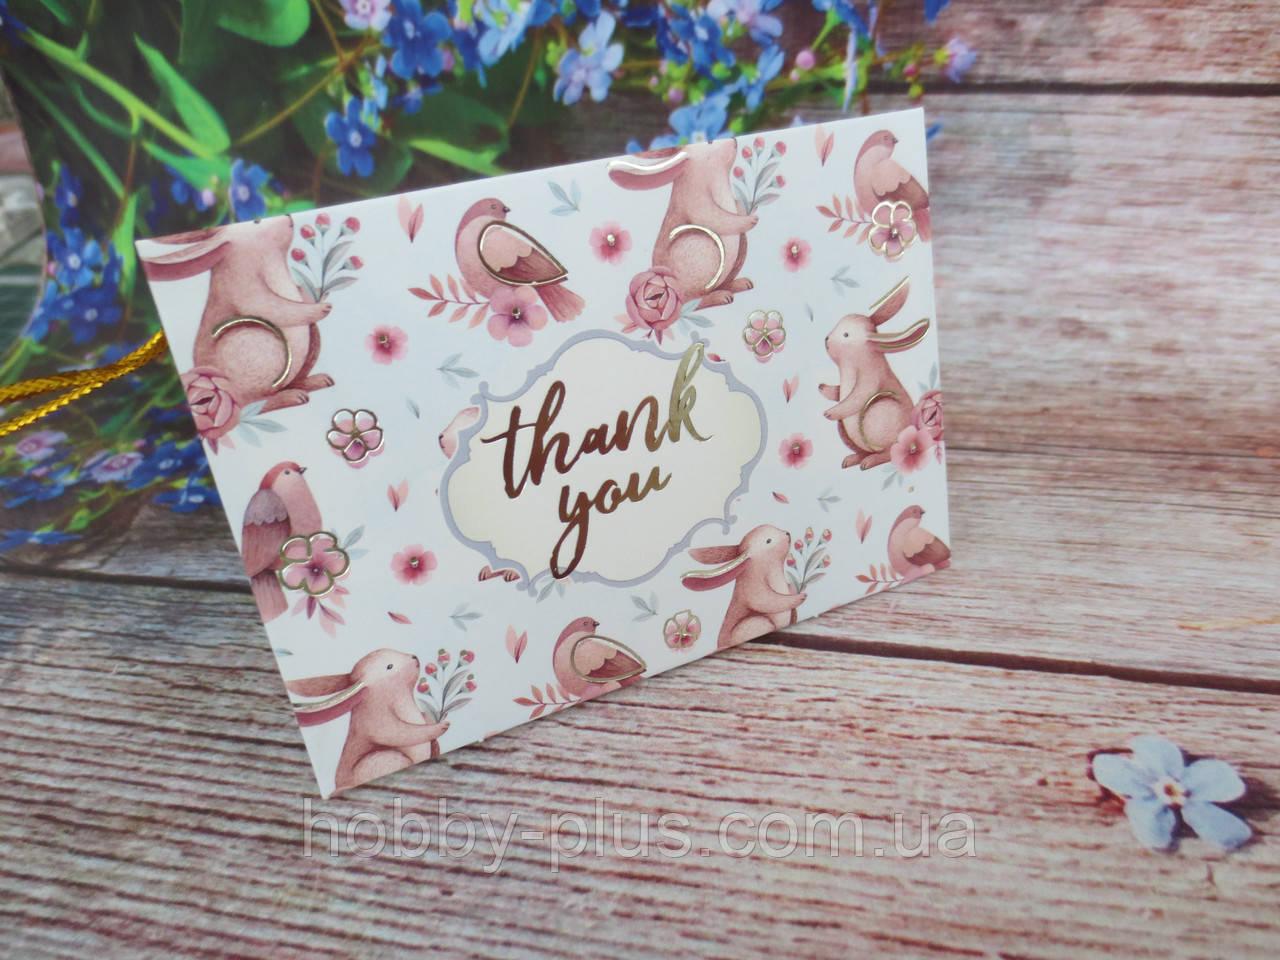 "Мини-открытка, тэг ""Thank you"", 92х62 мм, 1 шт"